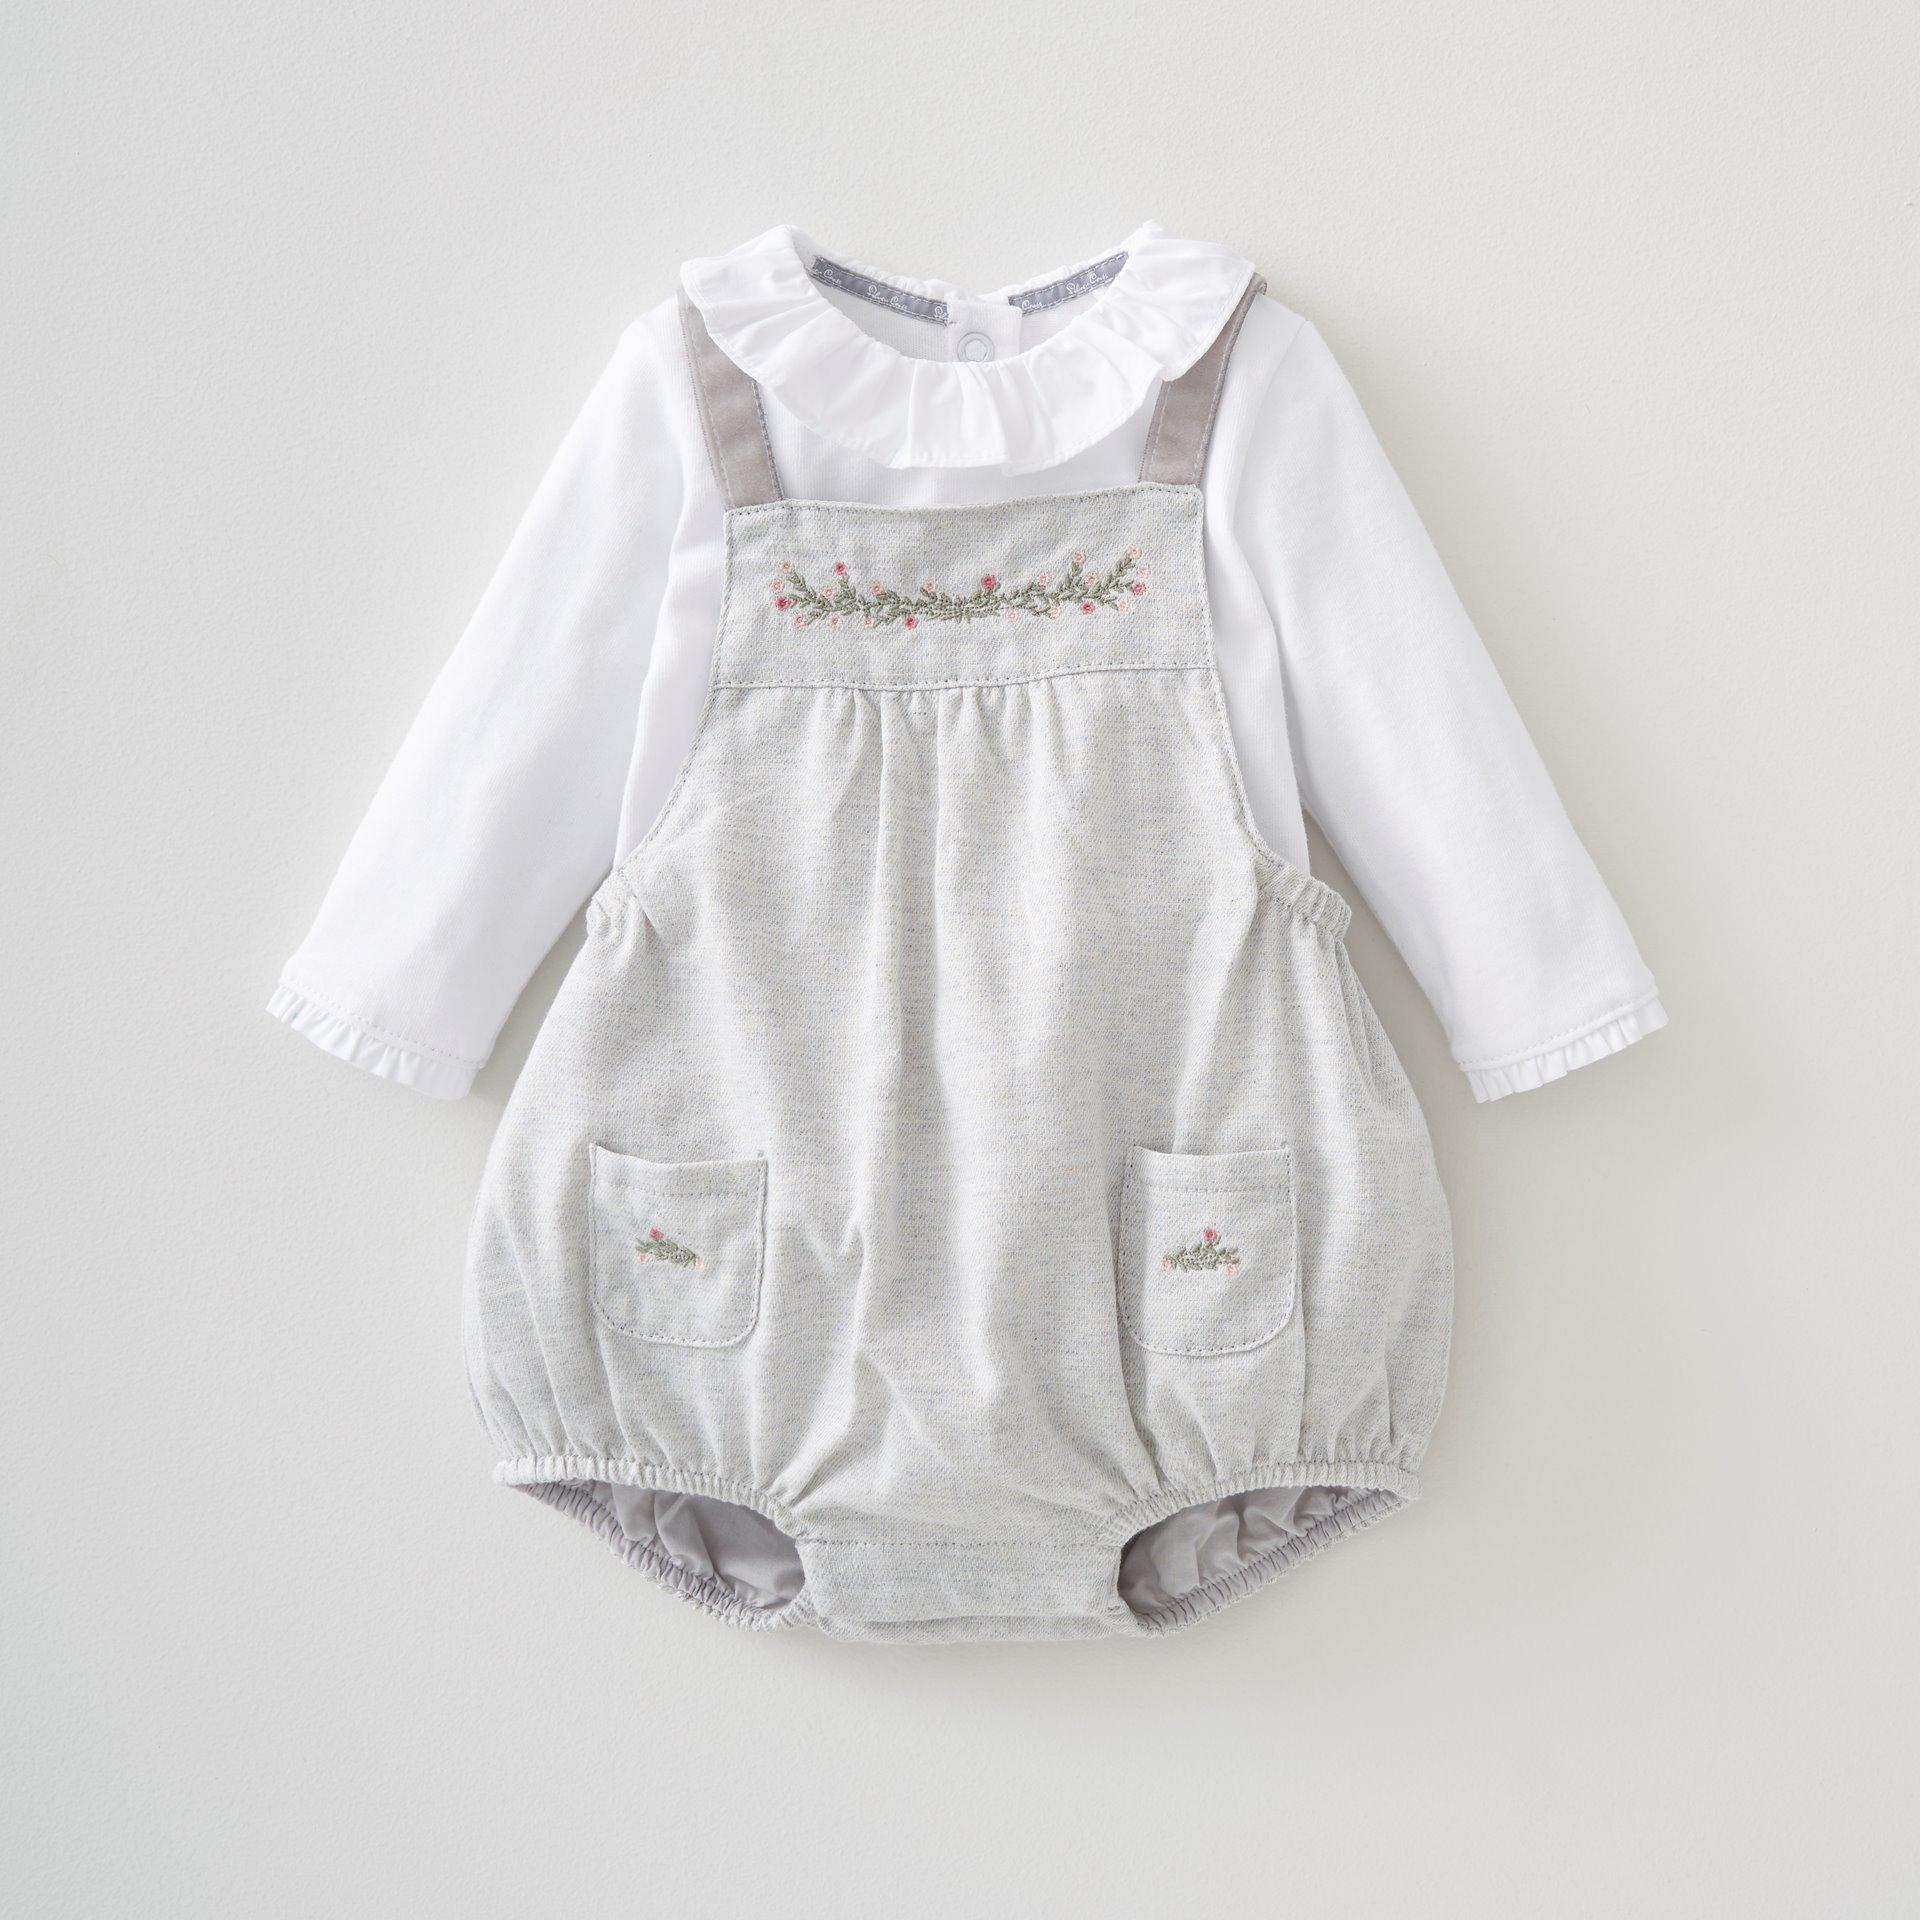 Girls 2 Pce Bloomer & Bodysuit Set 9-12 Months